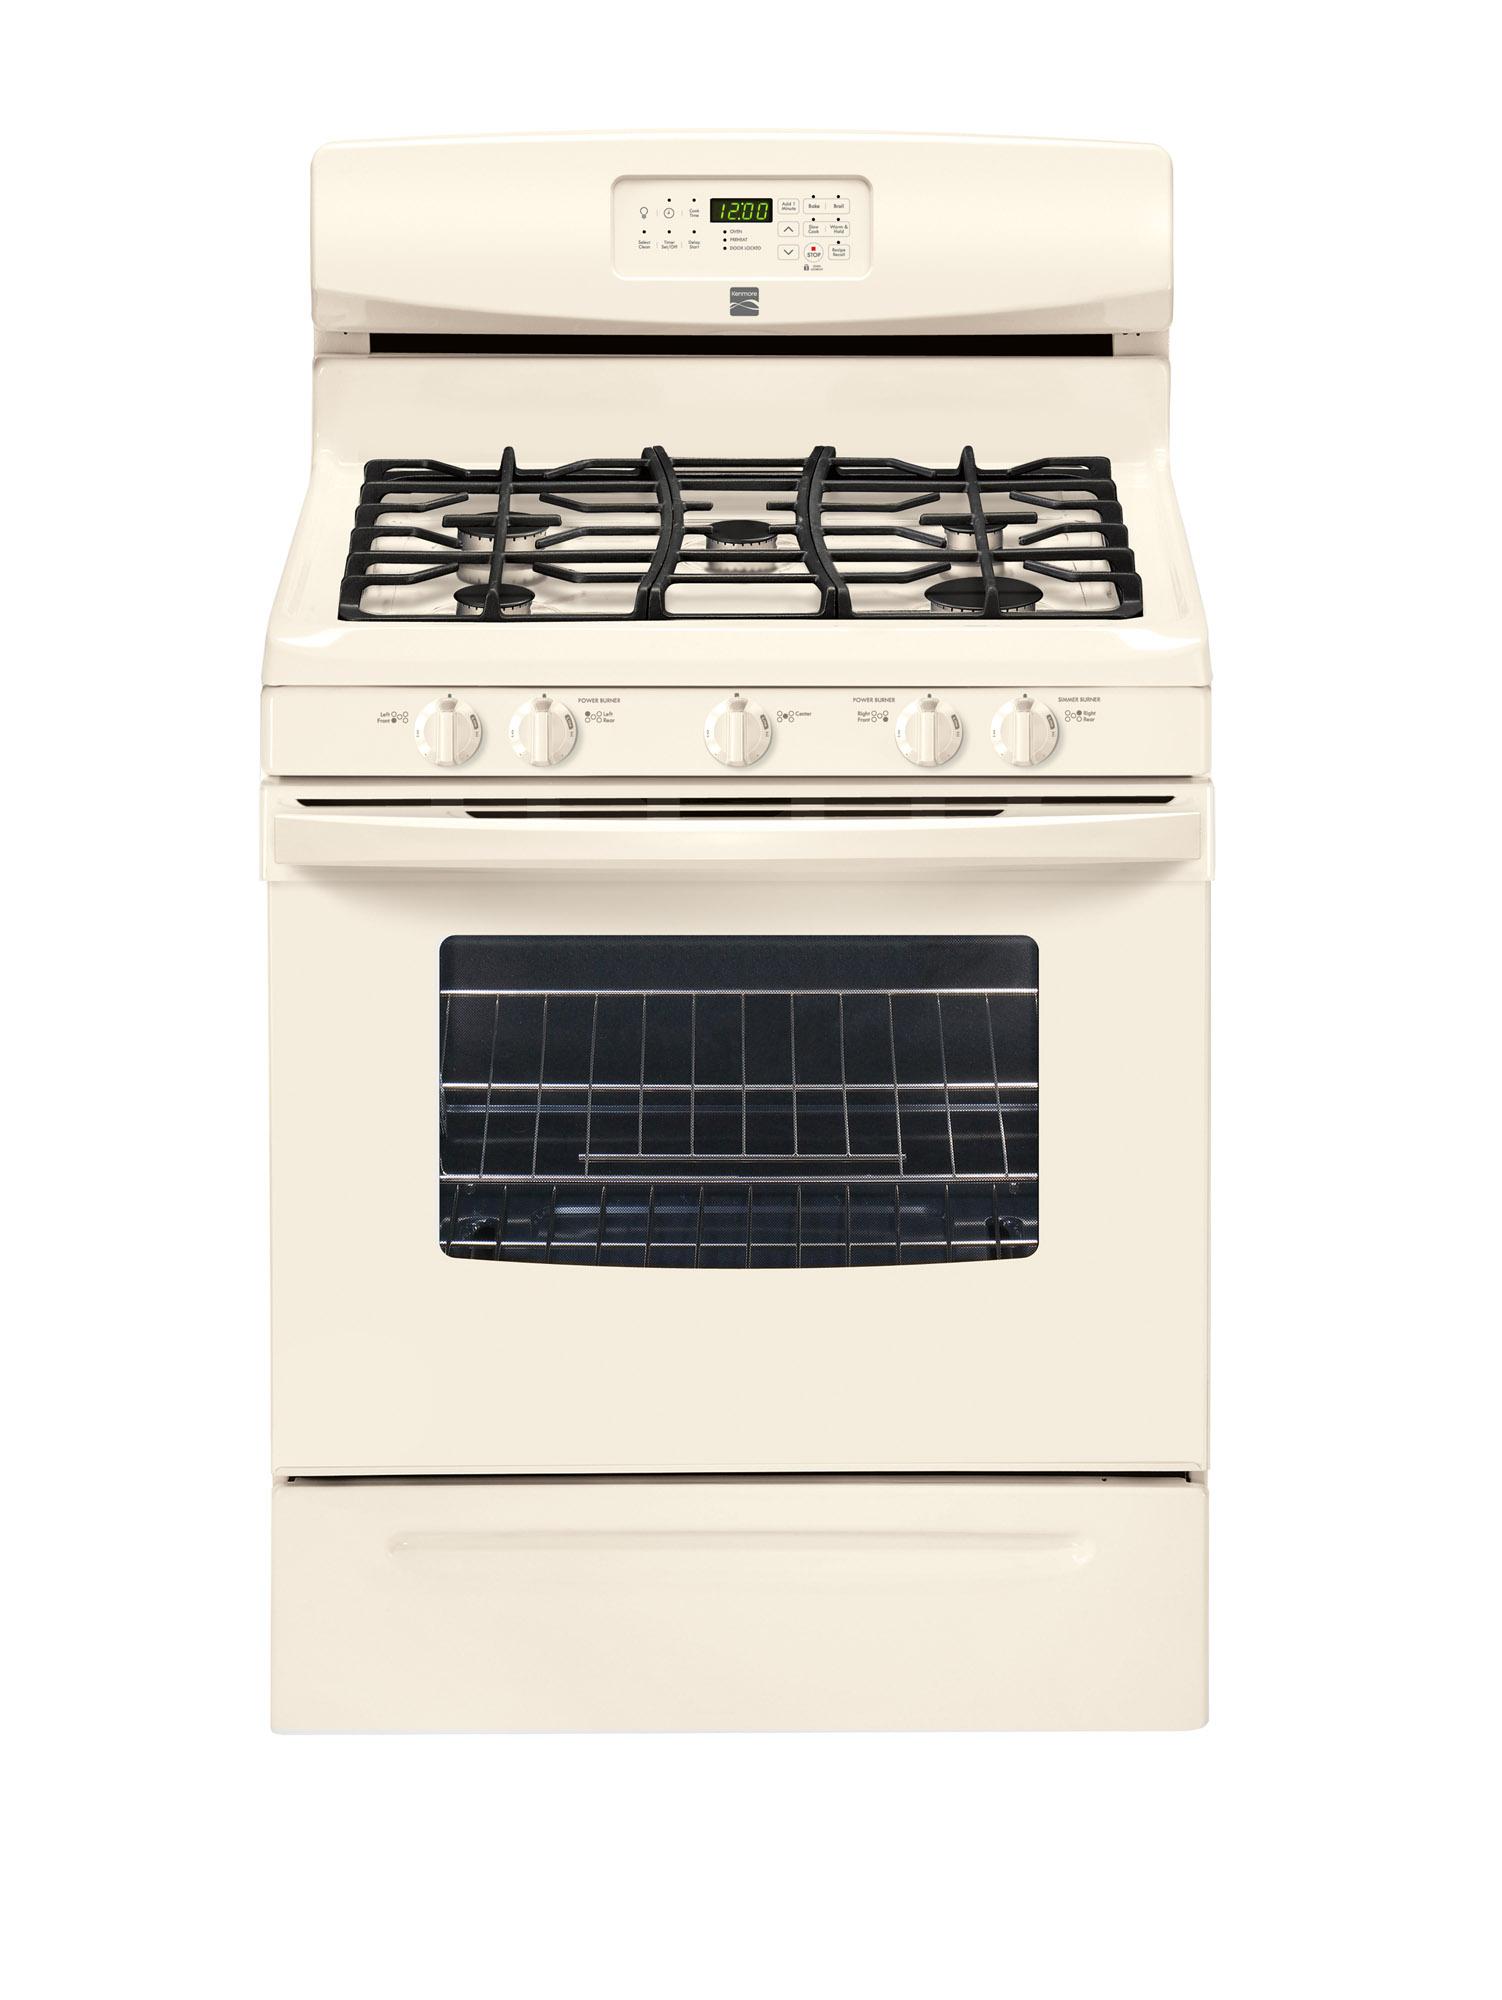 Kenmore Range/Stove/Oven Model 790.72704010 Parts